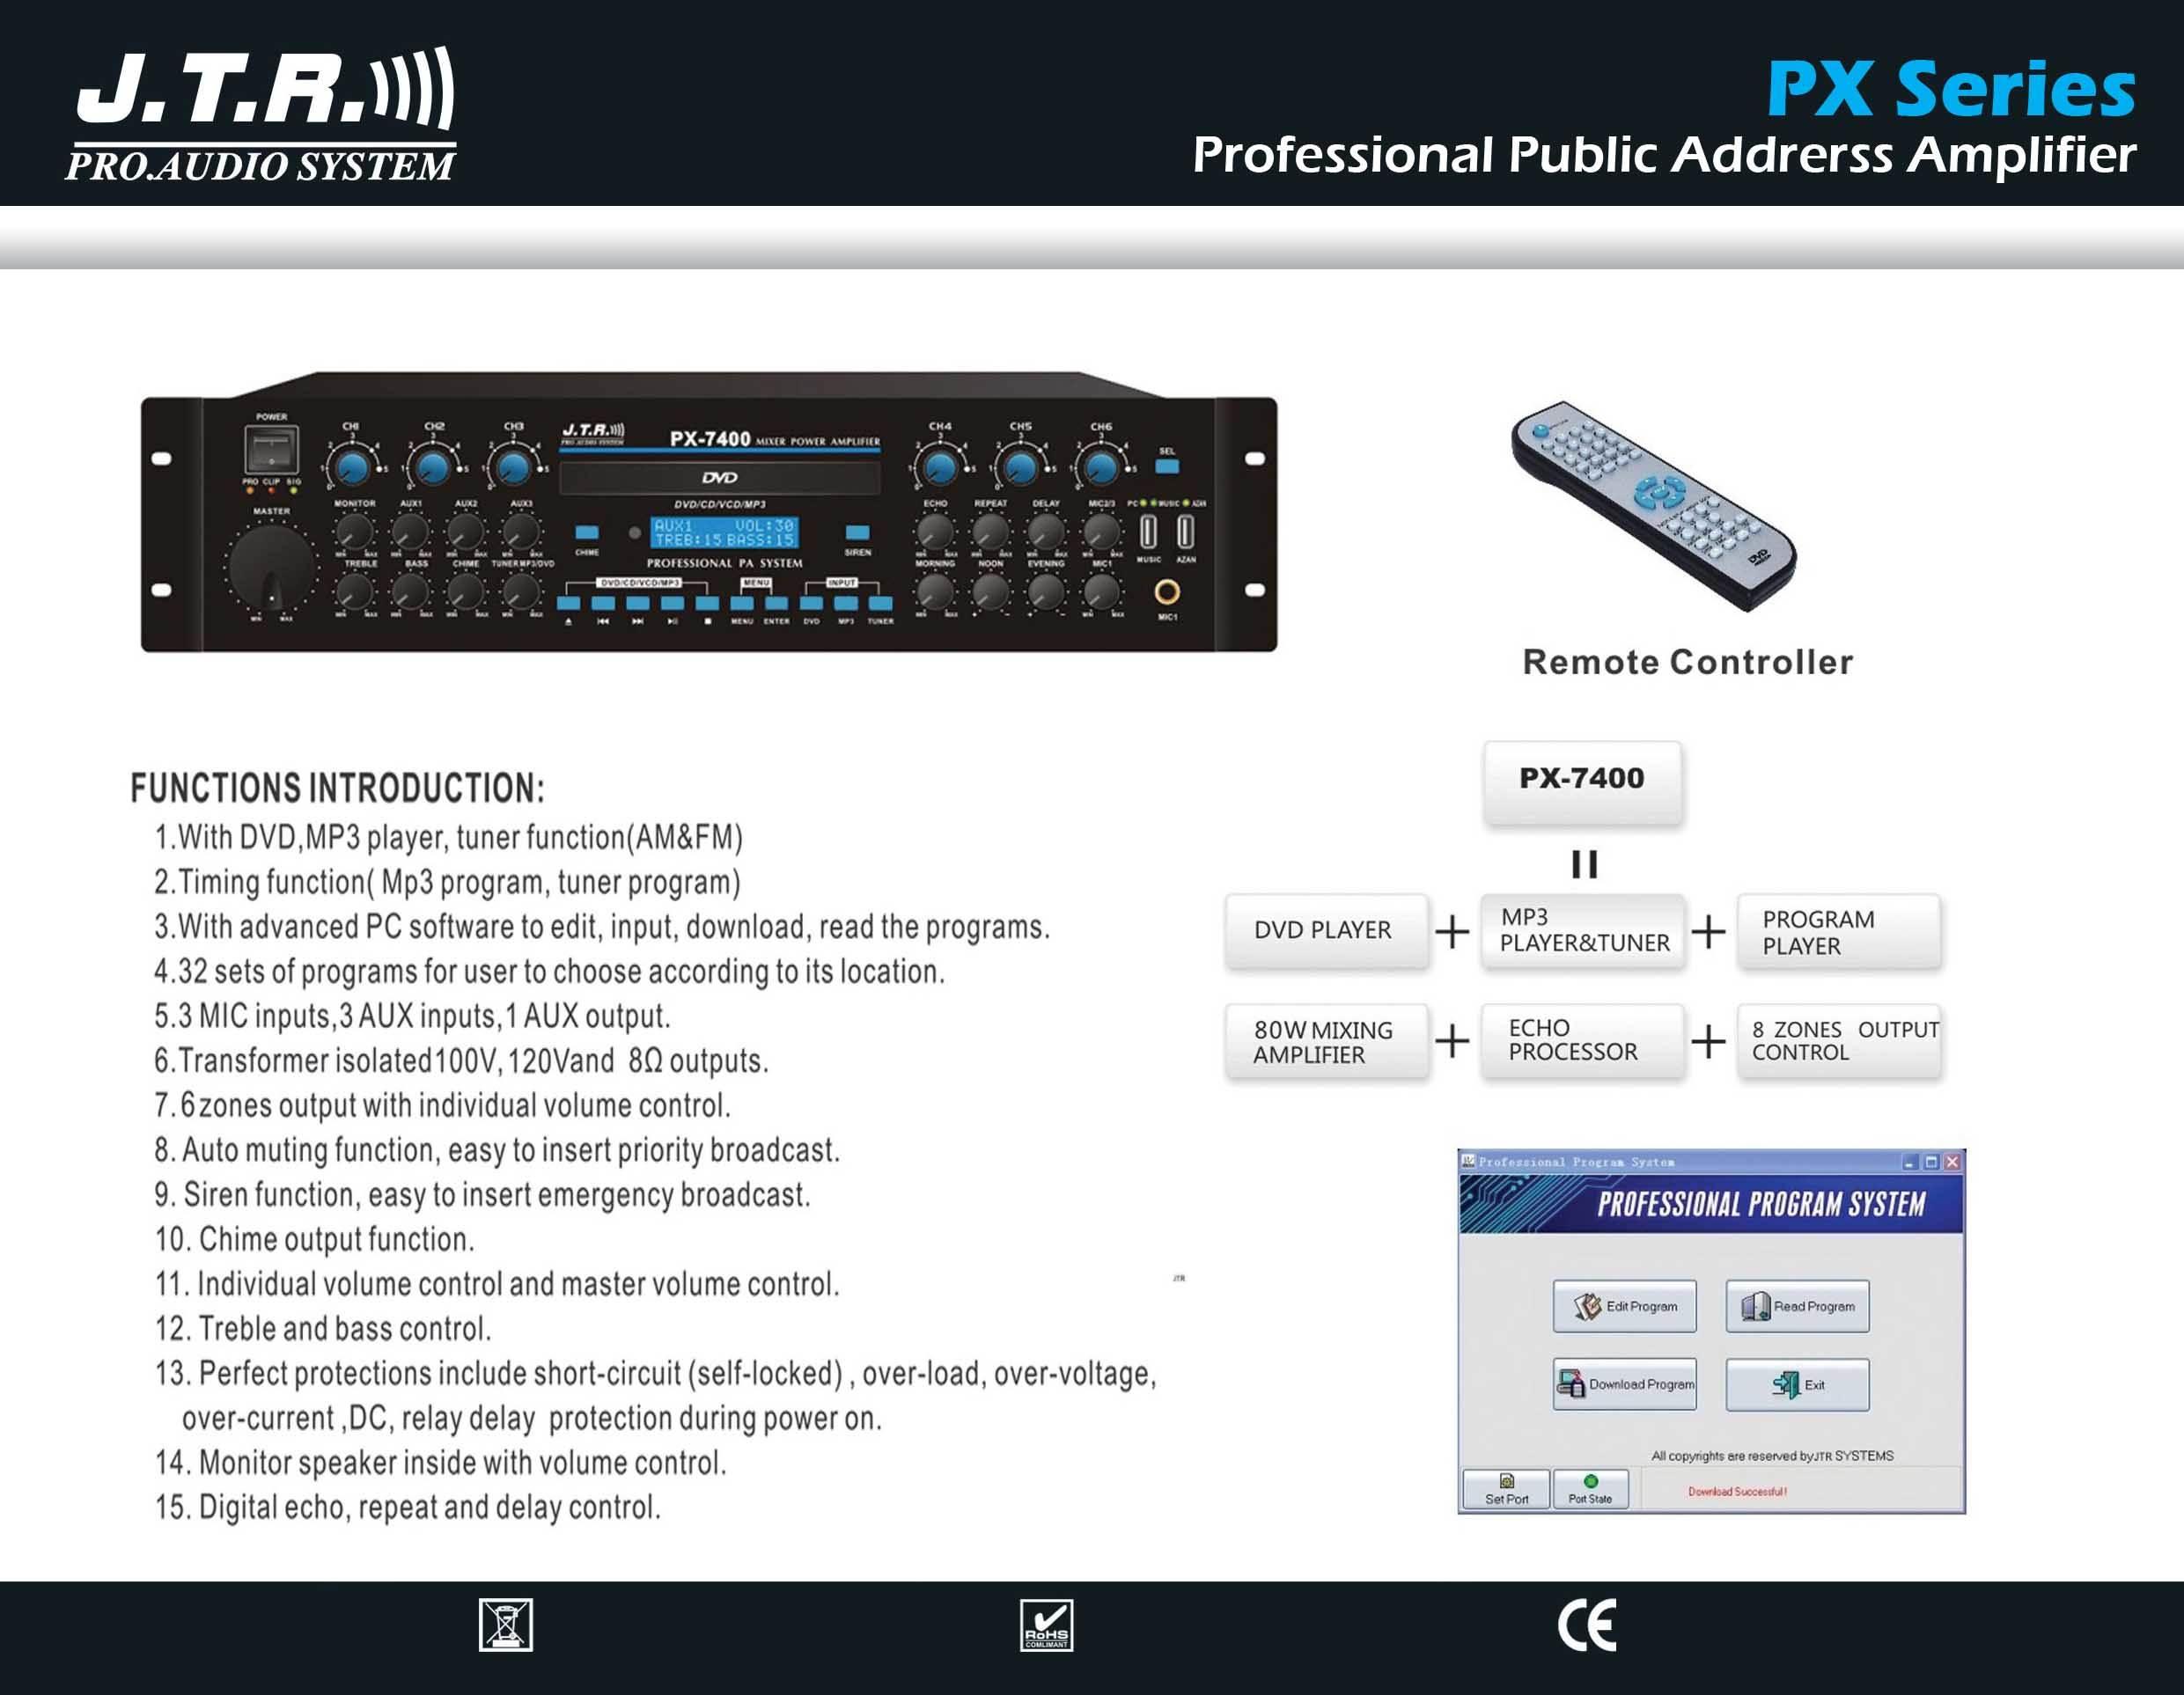 پاور آمپلی فایر آنالوگ محصول کمپانی JTR ( جی تی آر ) سری Public Addrerss Amplifier PX Series